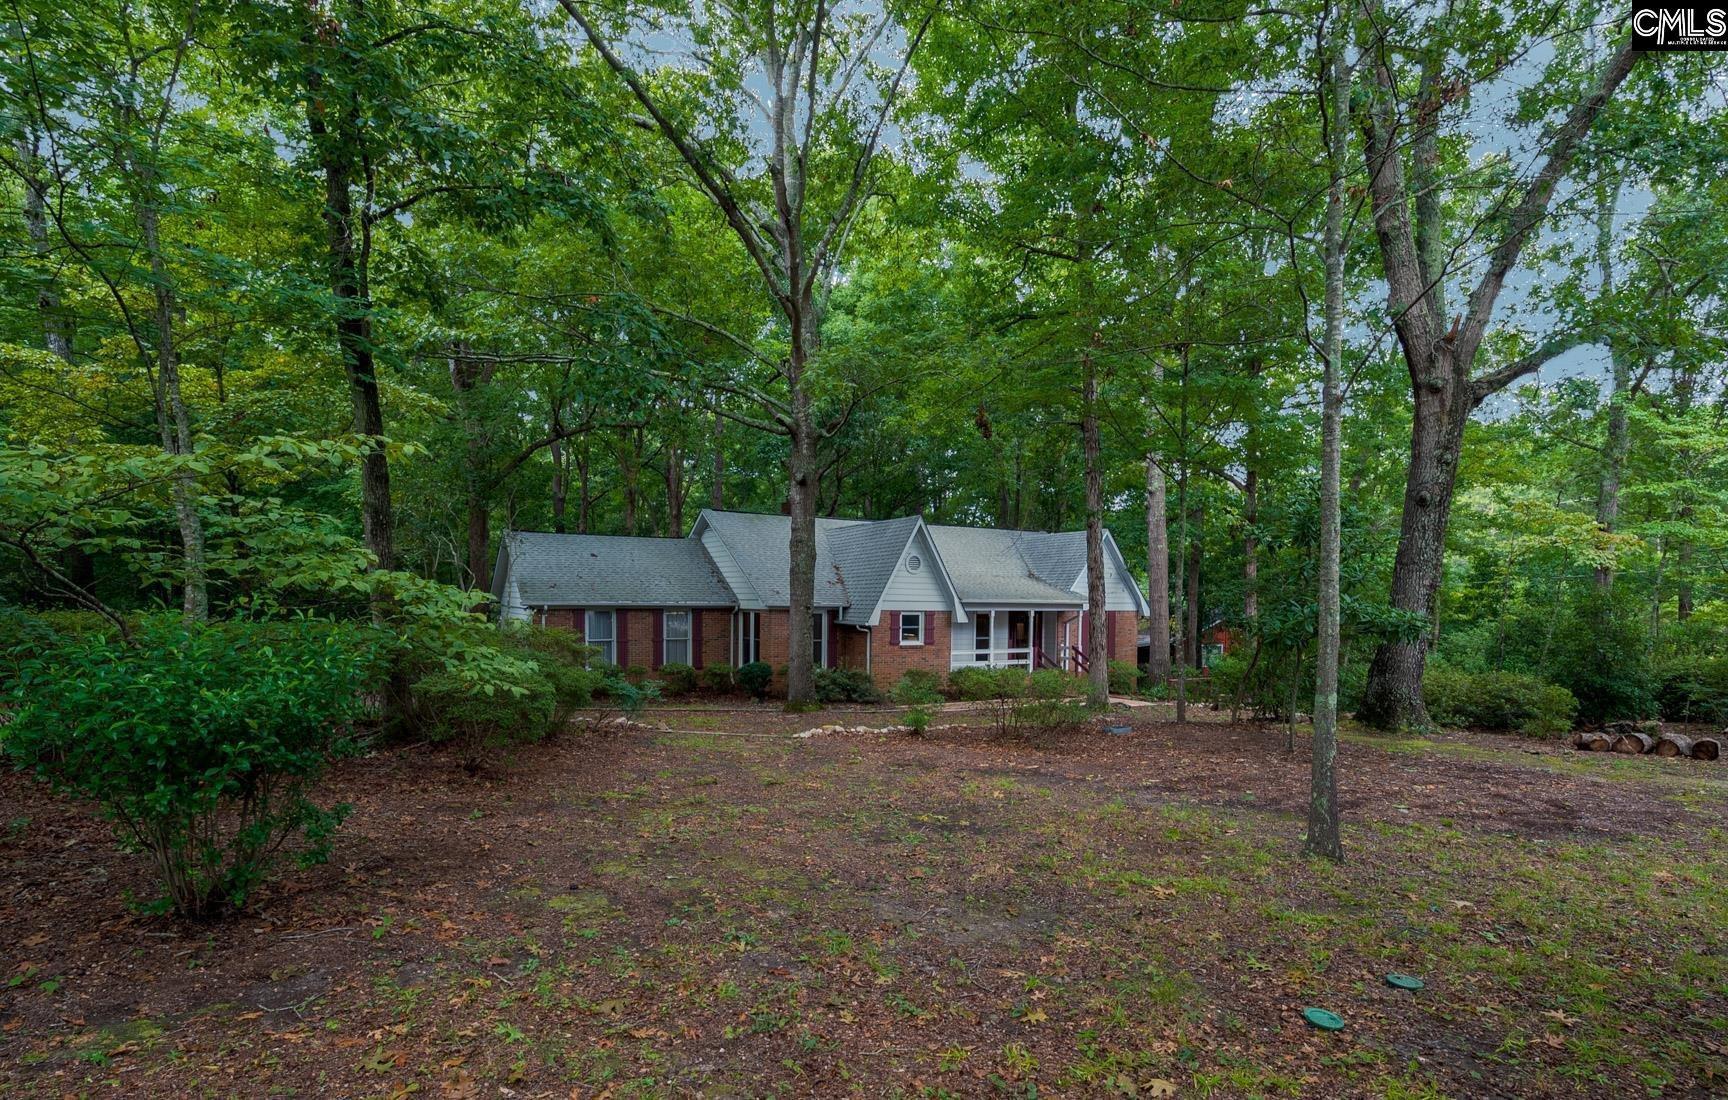 Lexington SC Home for Sale - Columbia SC Homes for Sale